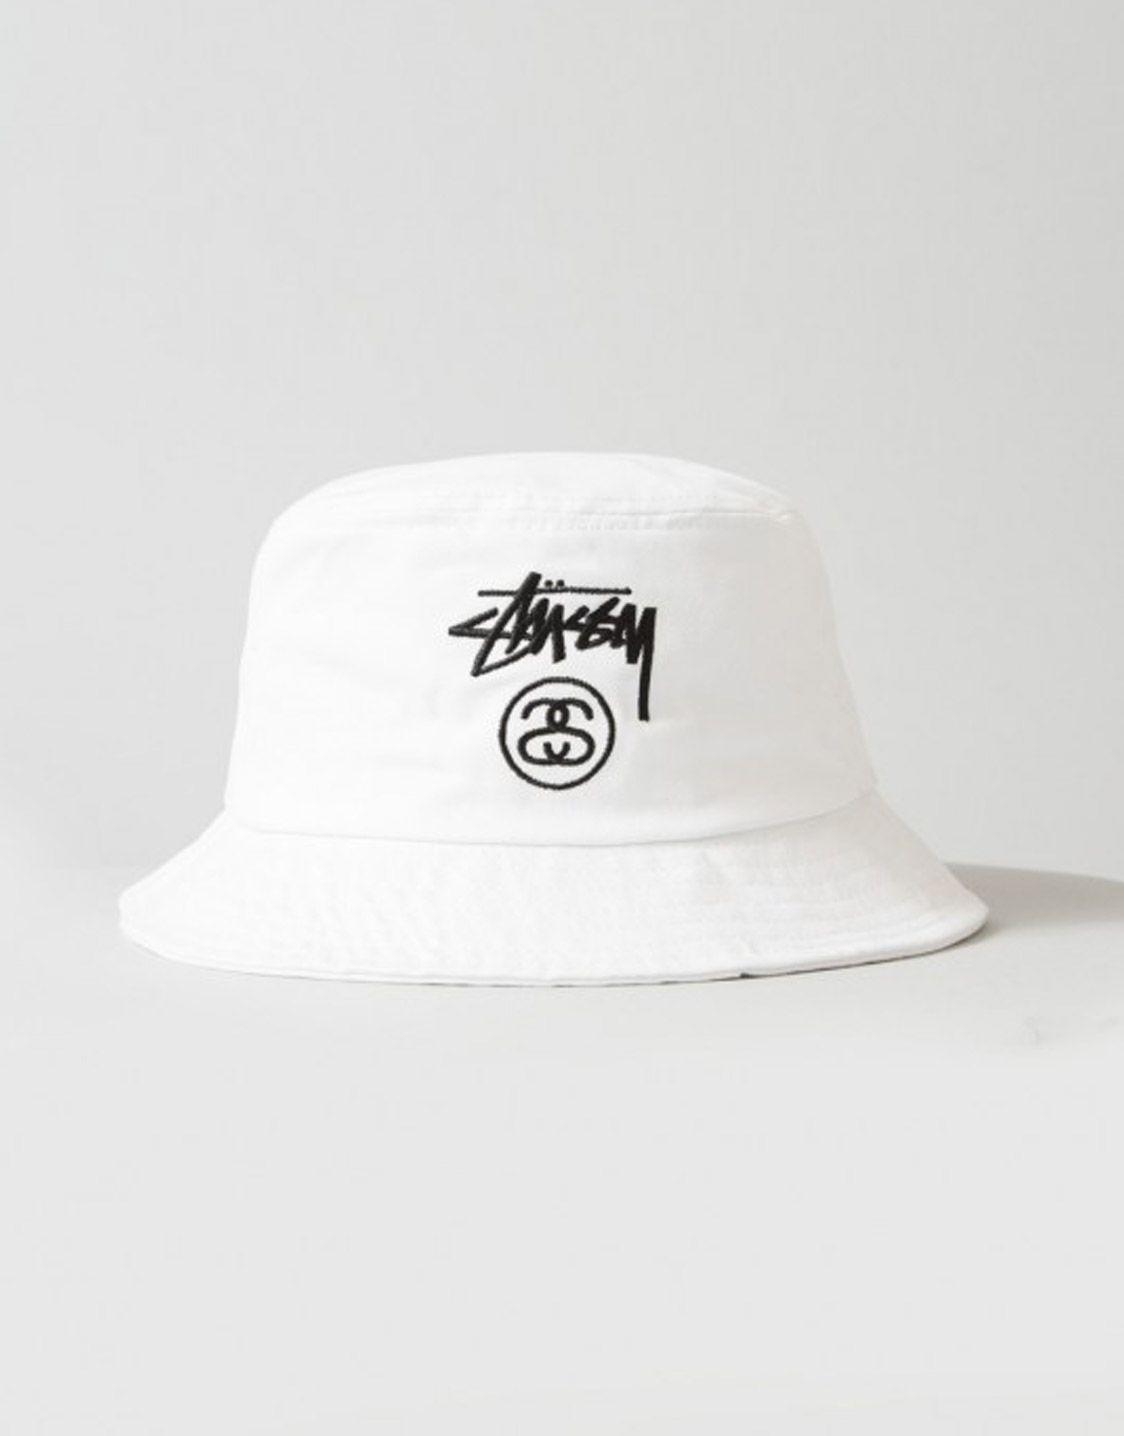 1b67137a4b2011 Stussy - Stock lock bucket hat white | fashion in 2019